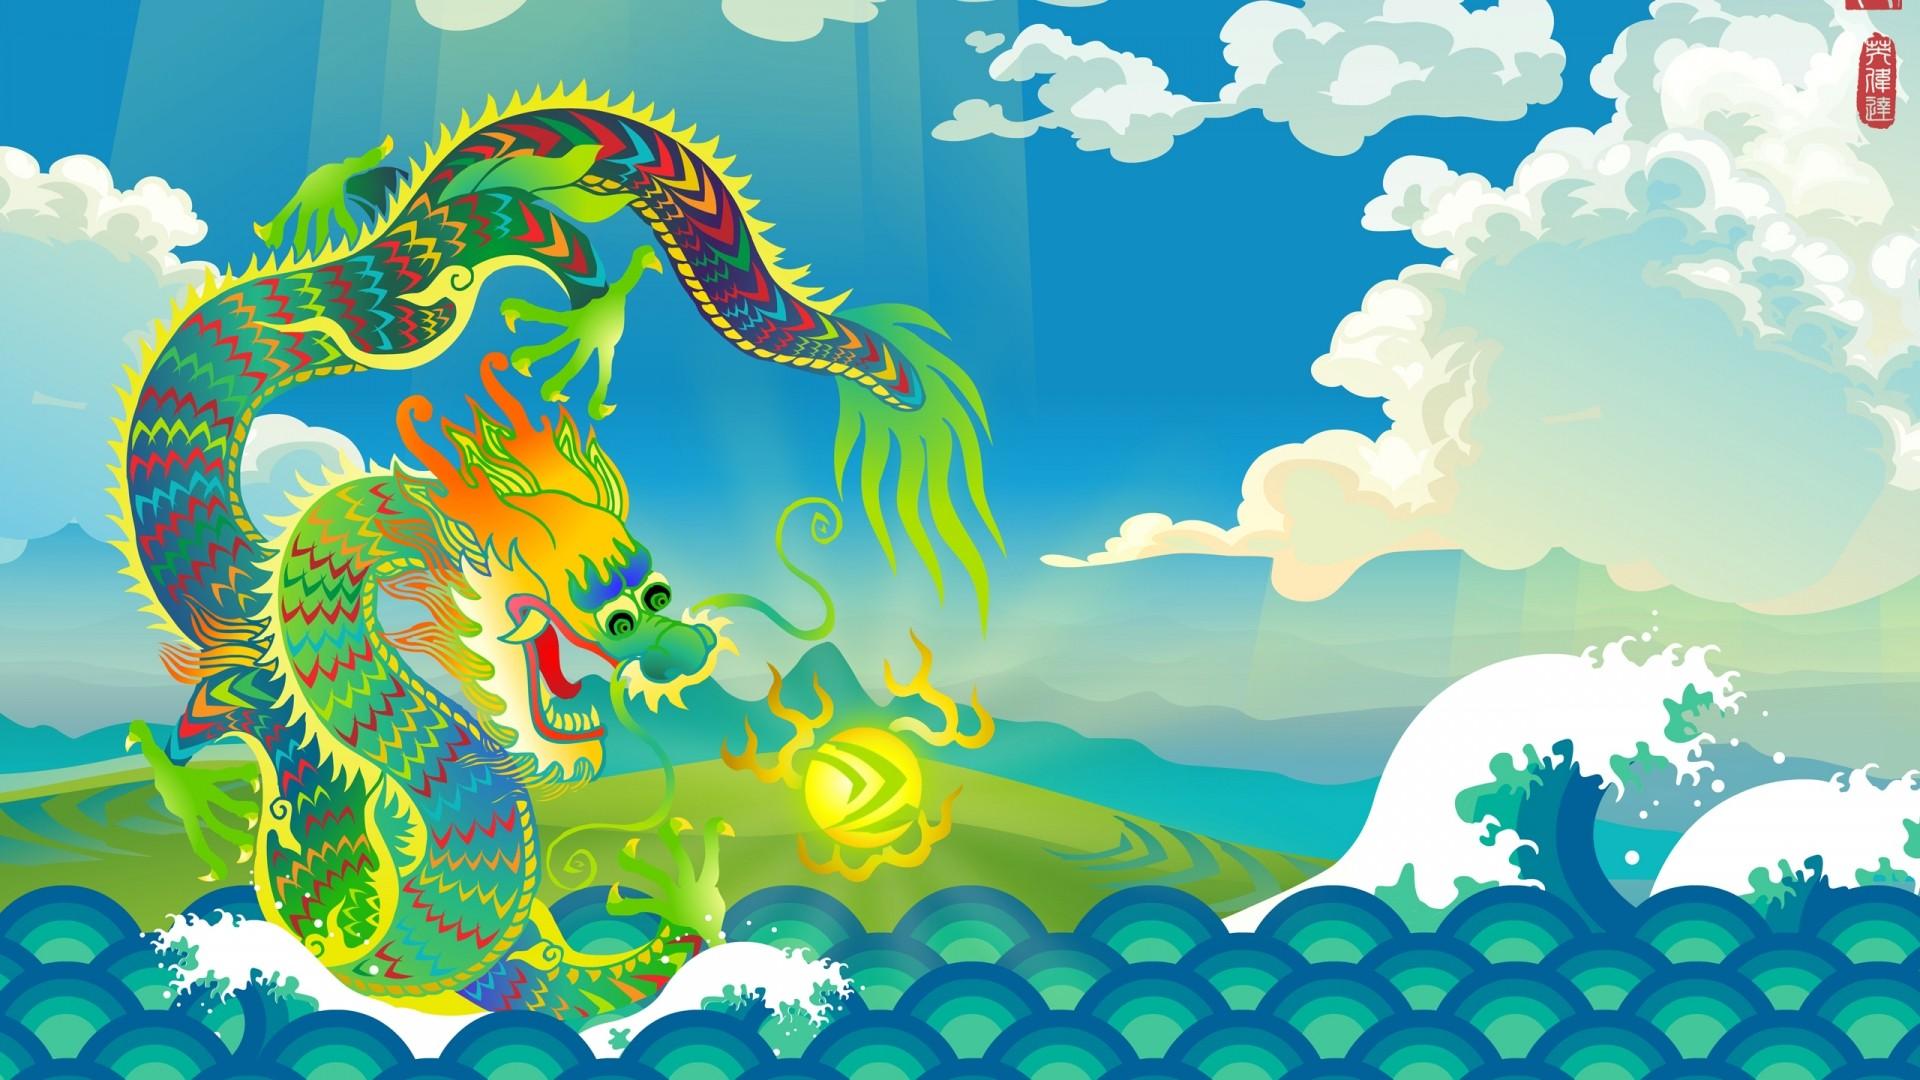 Chinese Dragon a wallpaper